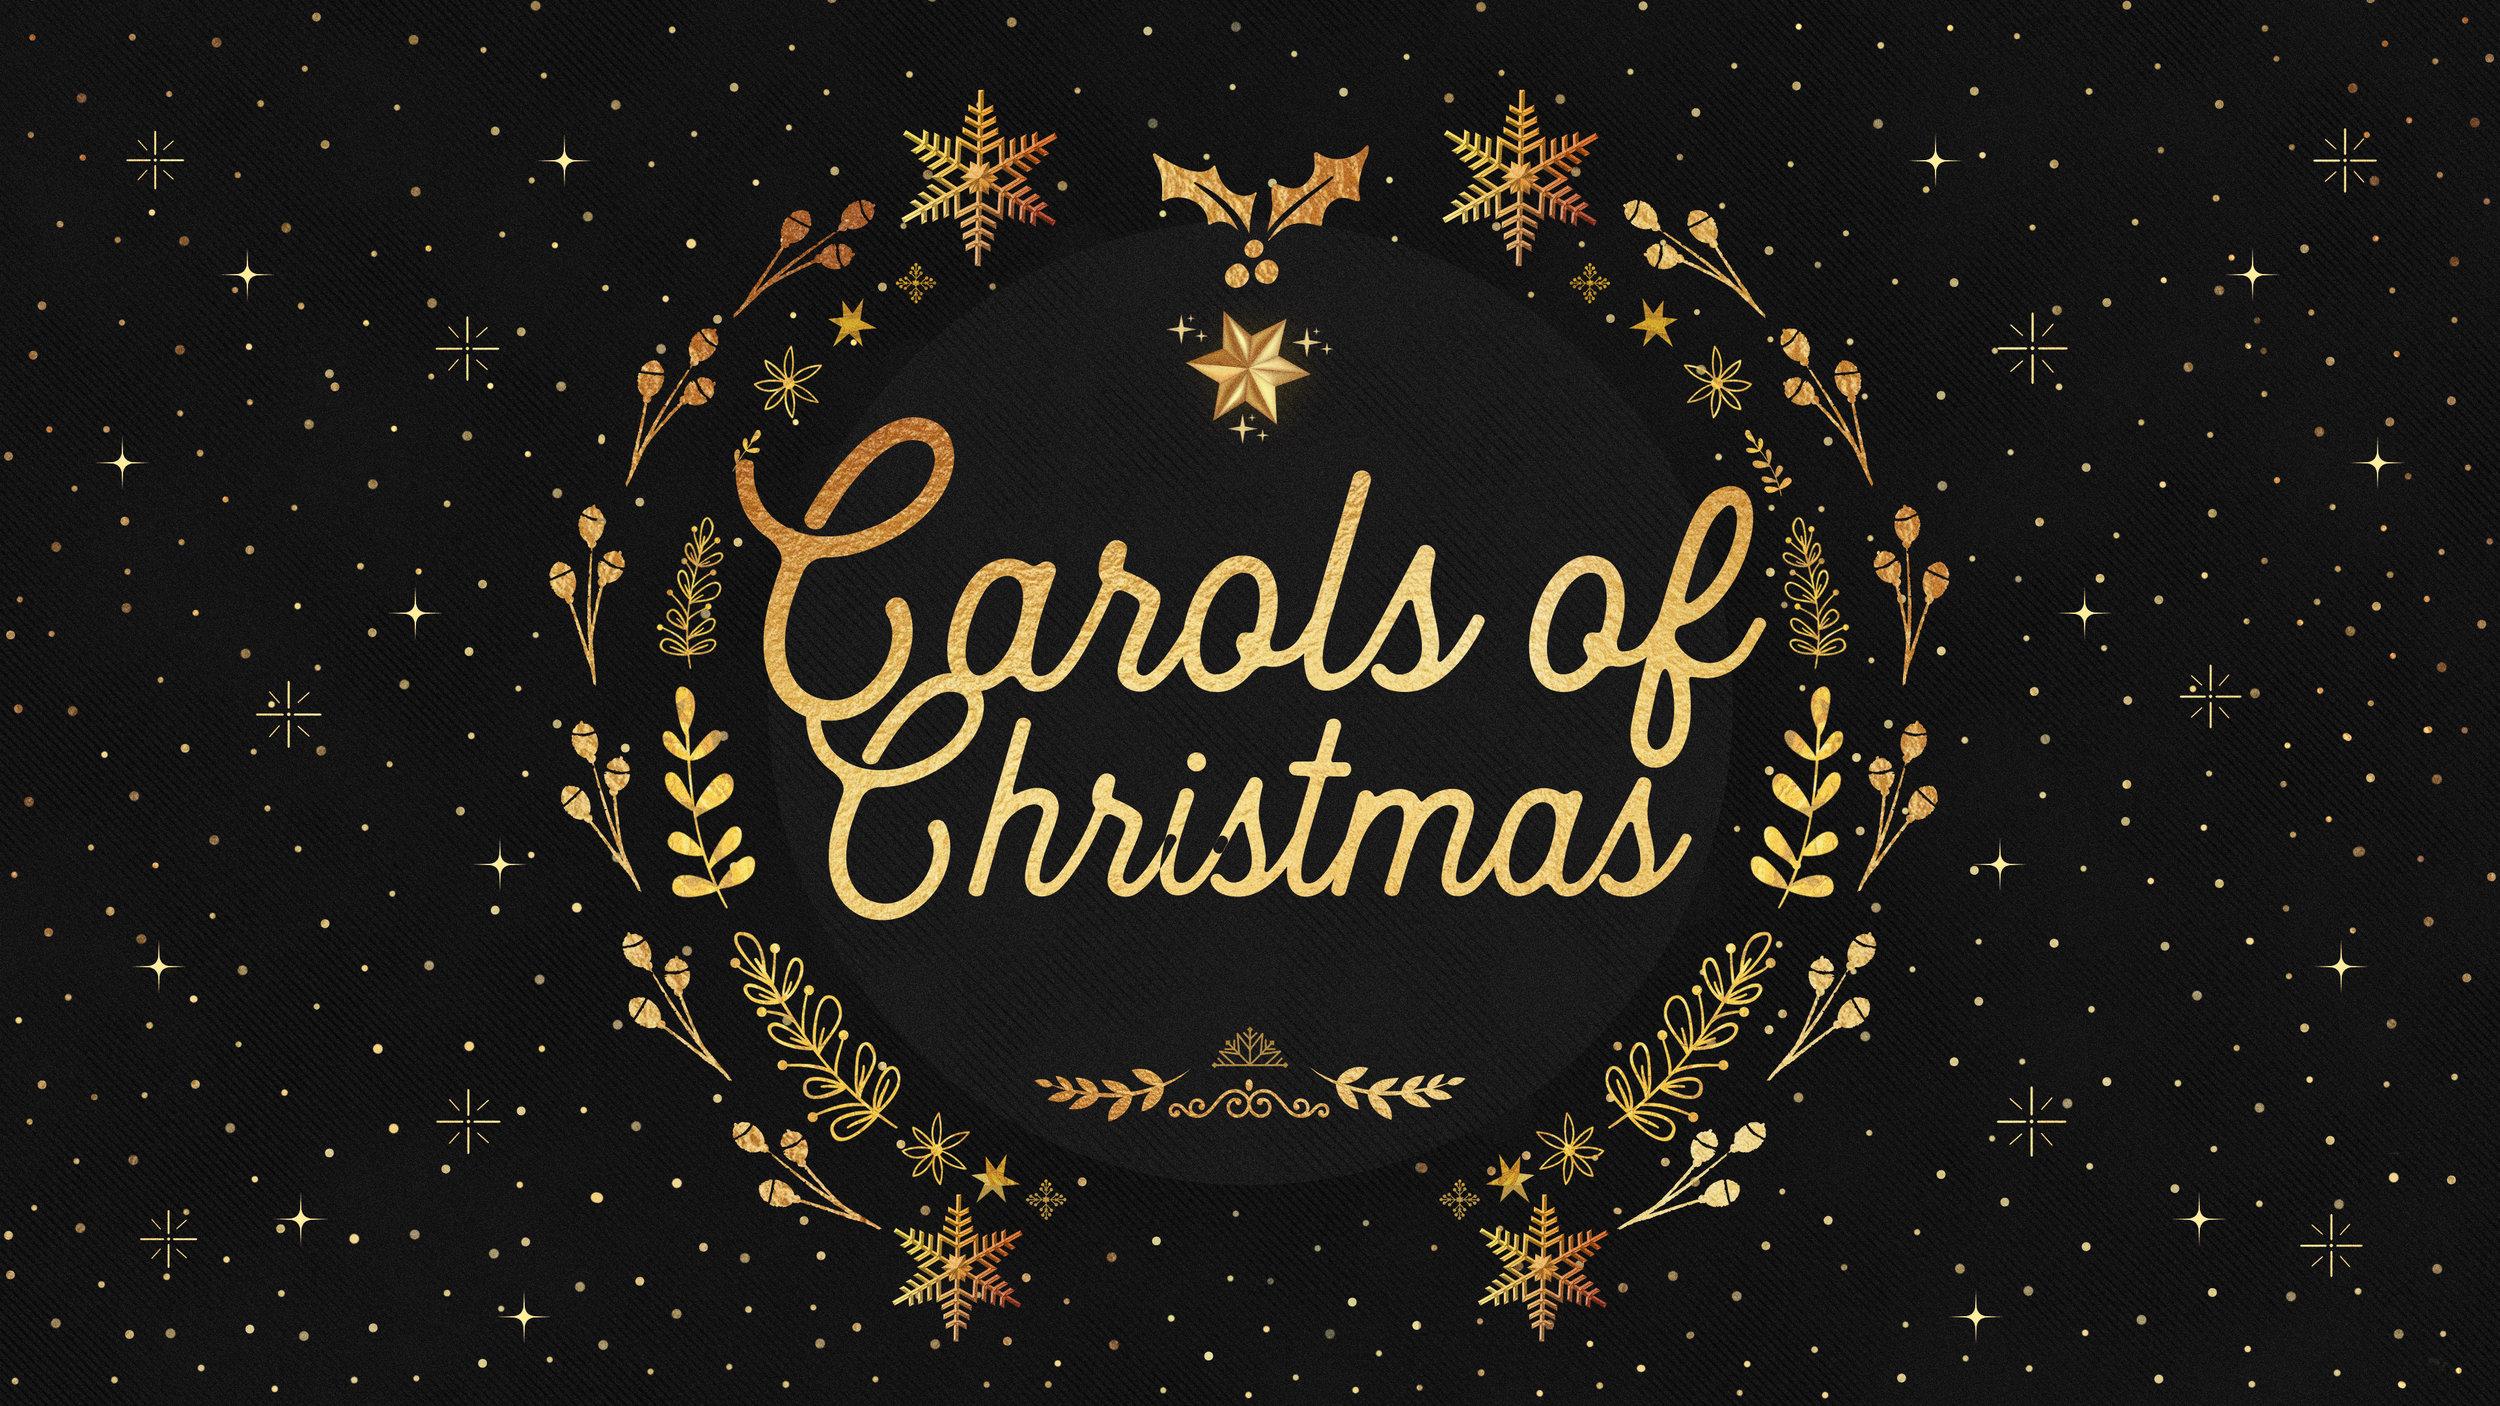 Carols of Christmas Main Slide.jpg